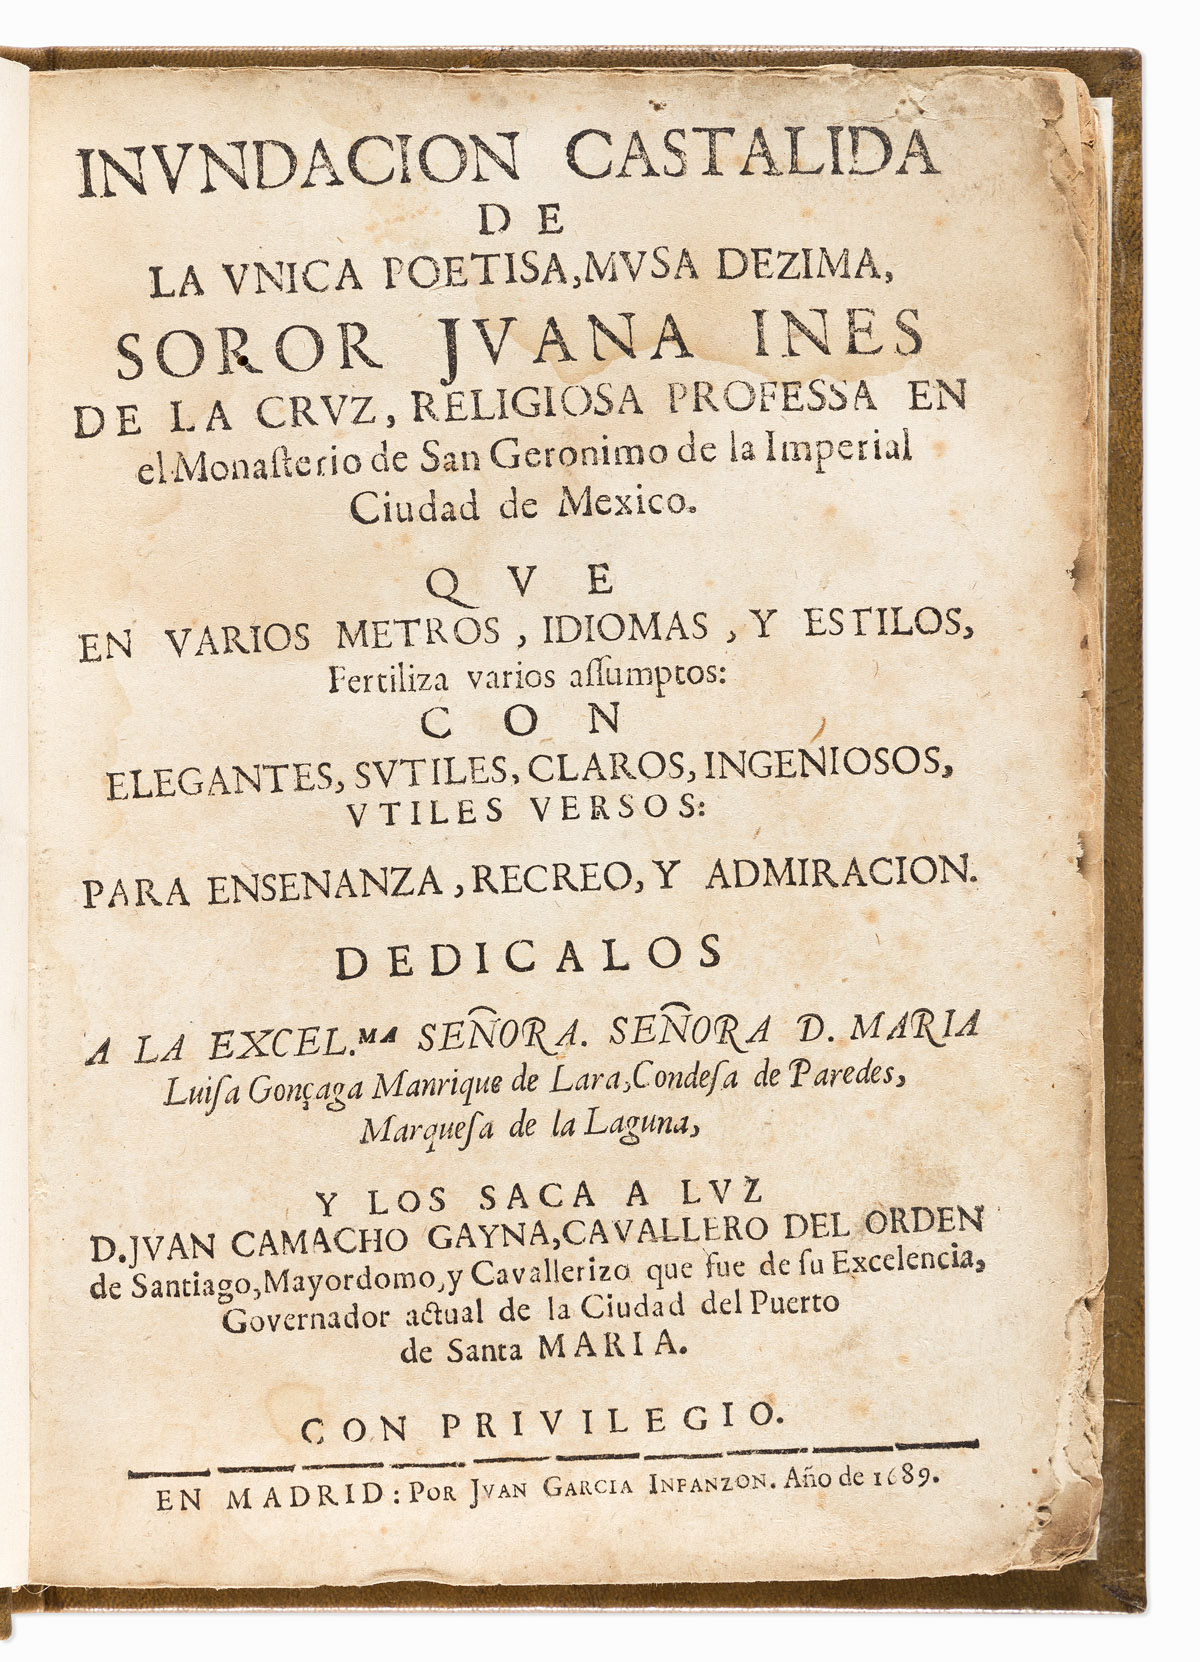 (MEXICAN LITERATURE.) Juana Inés de la Cruz. Complete set of her collected works.